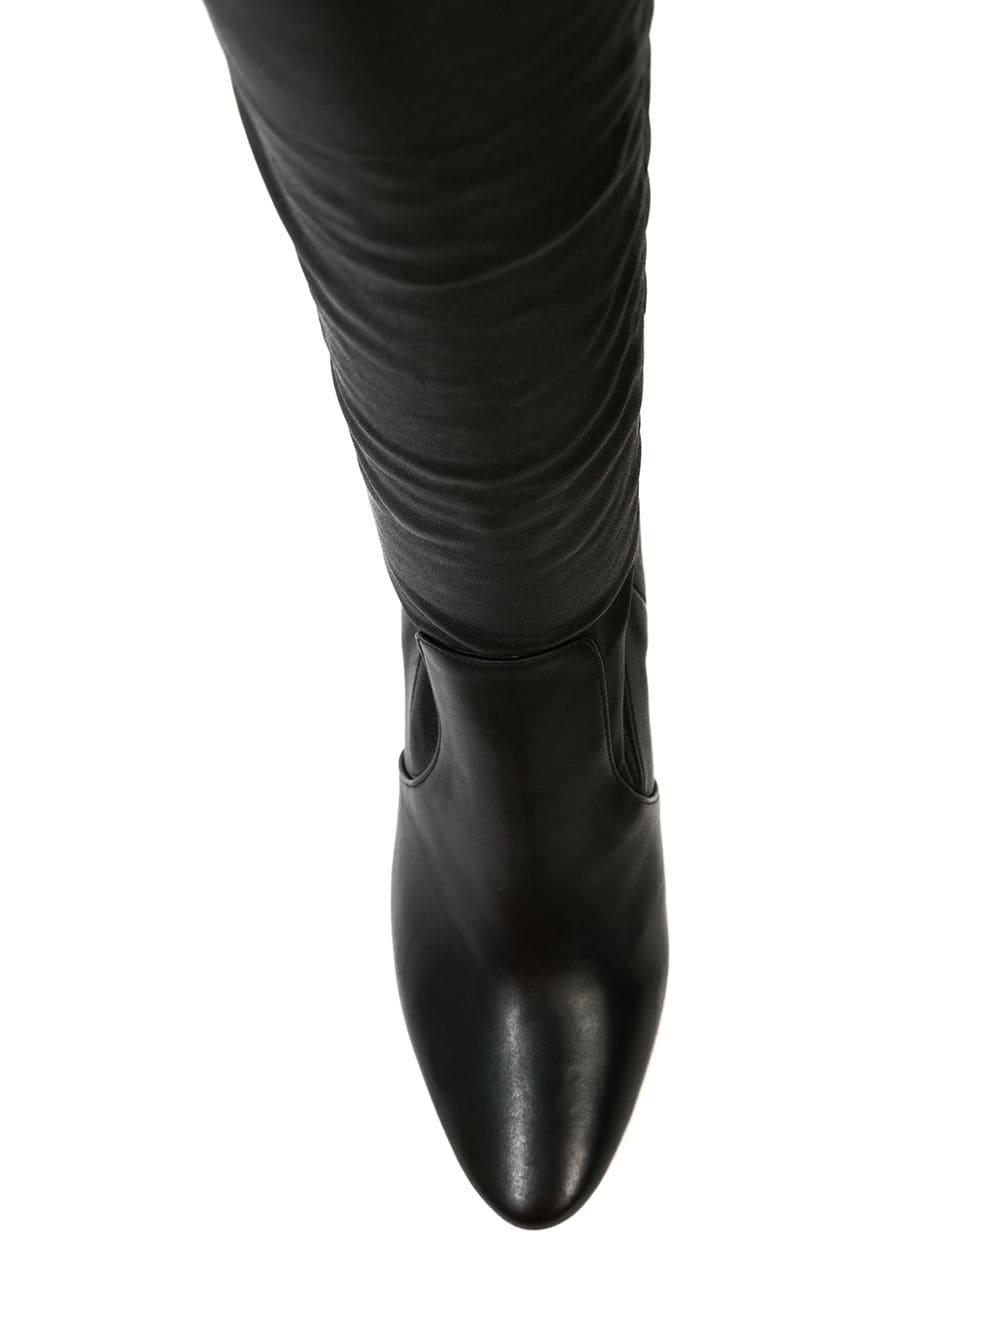 Tamara Mellon Leather legging Boot Combo in Black